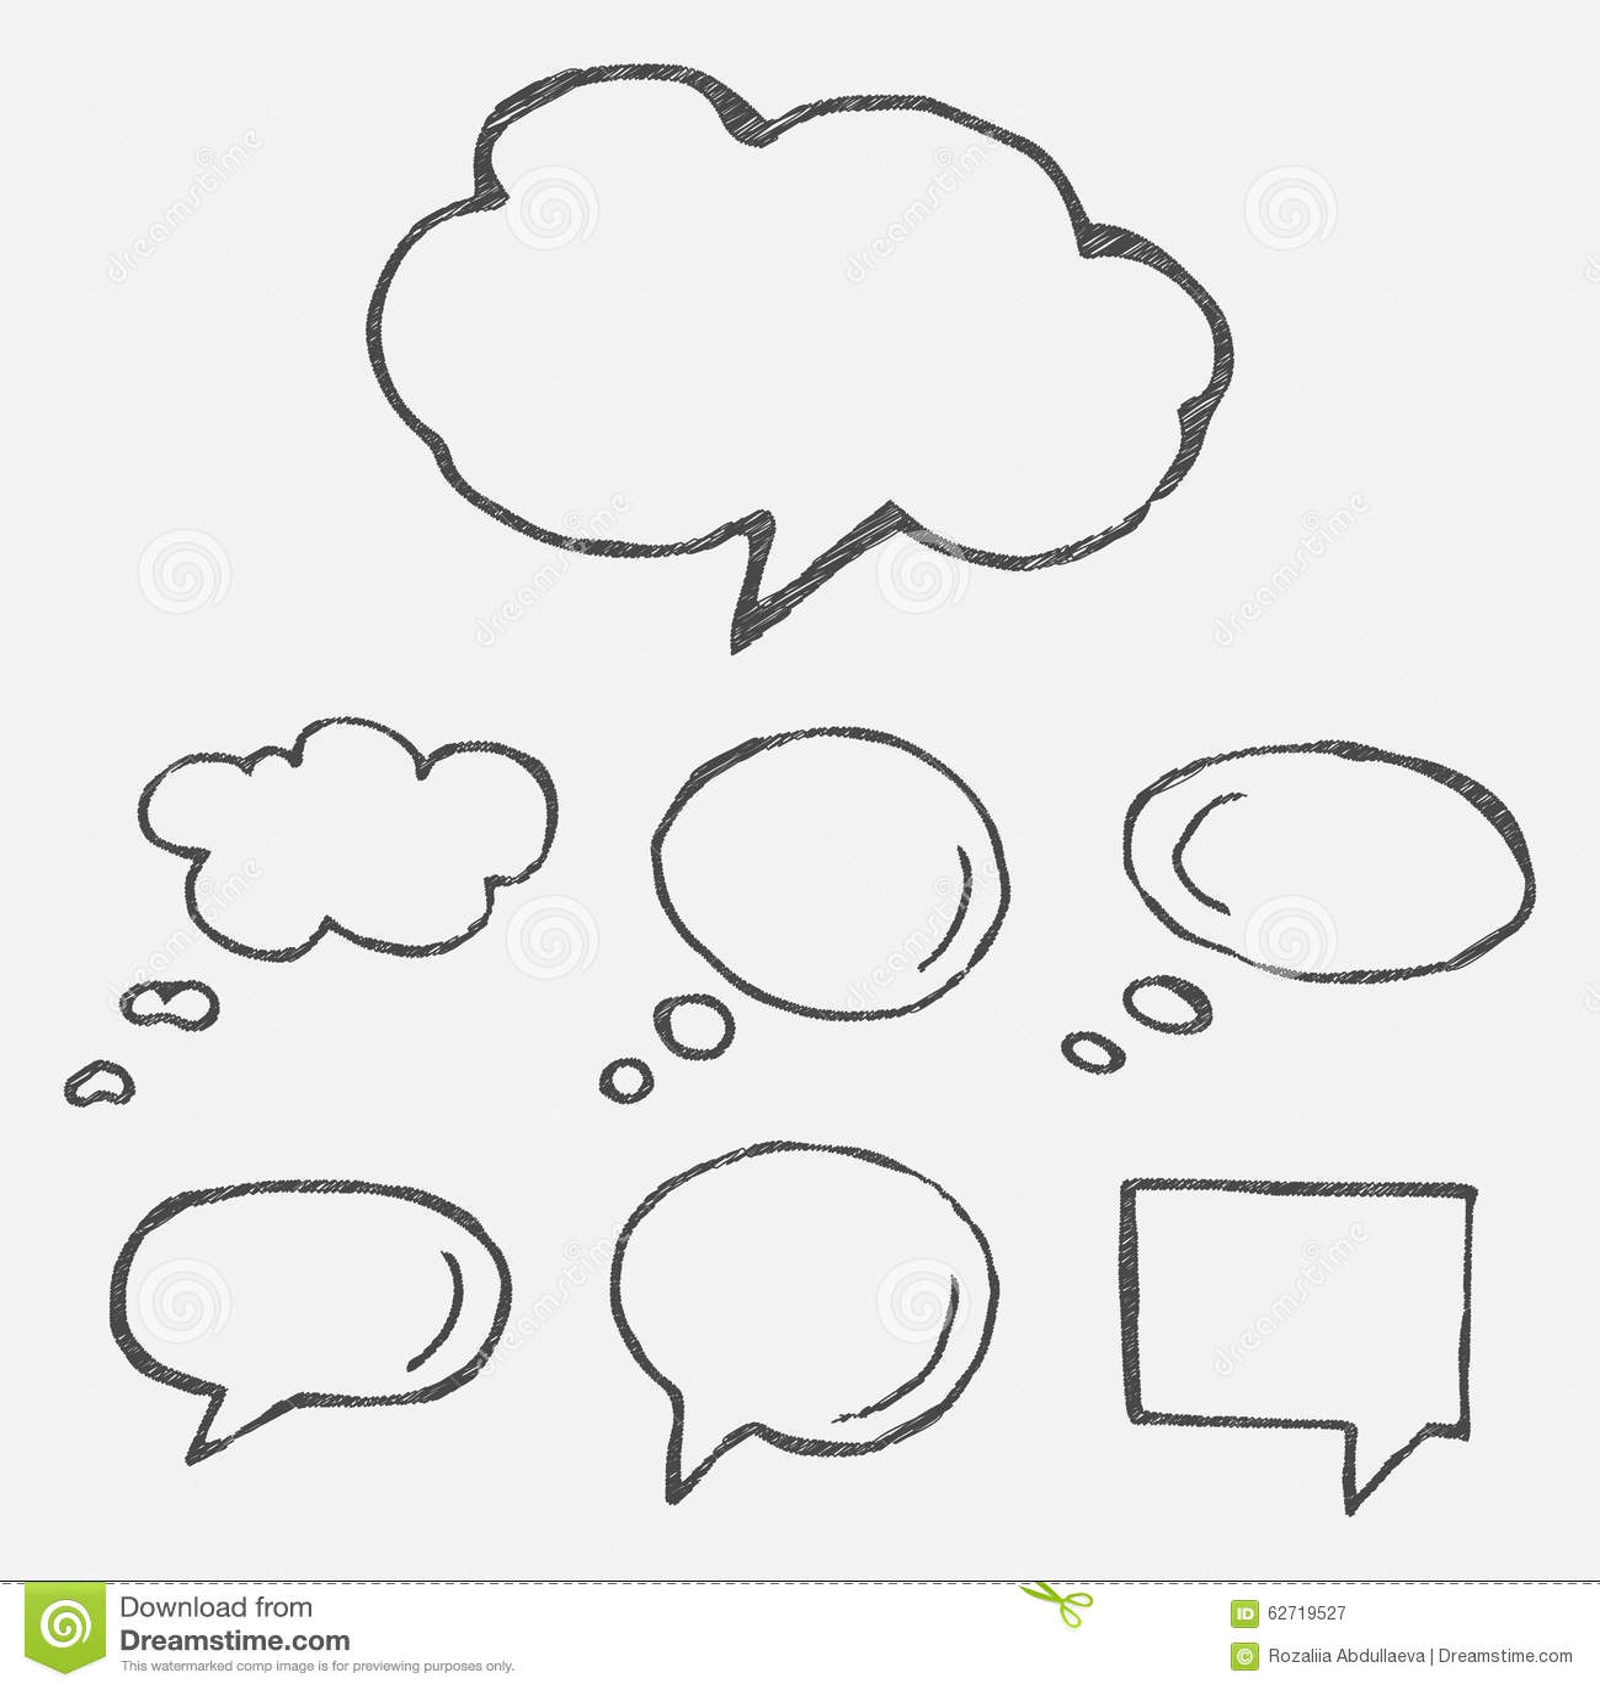 Think cloud symbols stock vector. Illustration of cloud ...